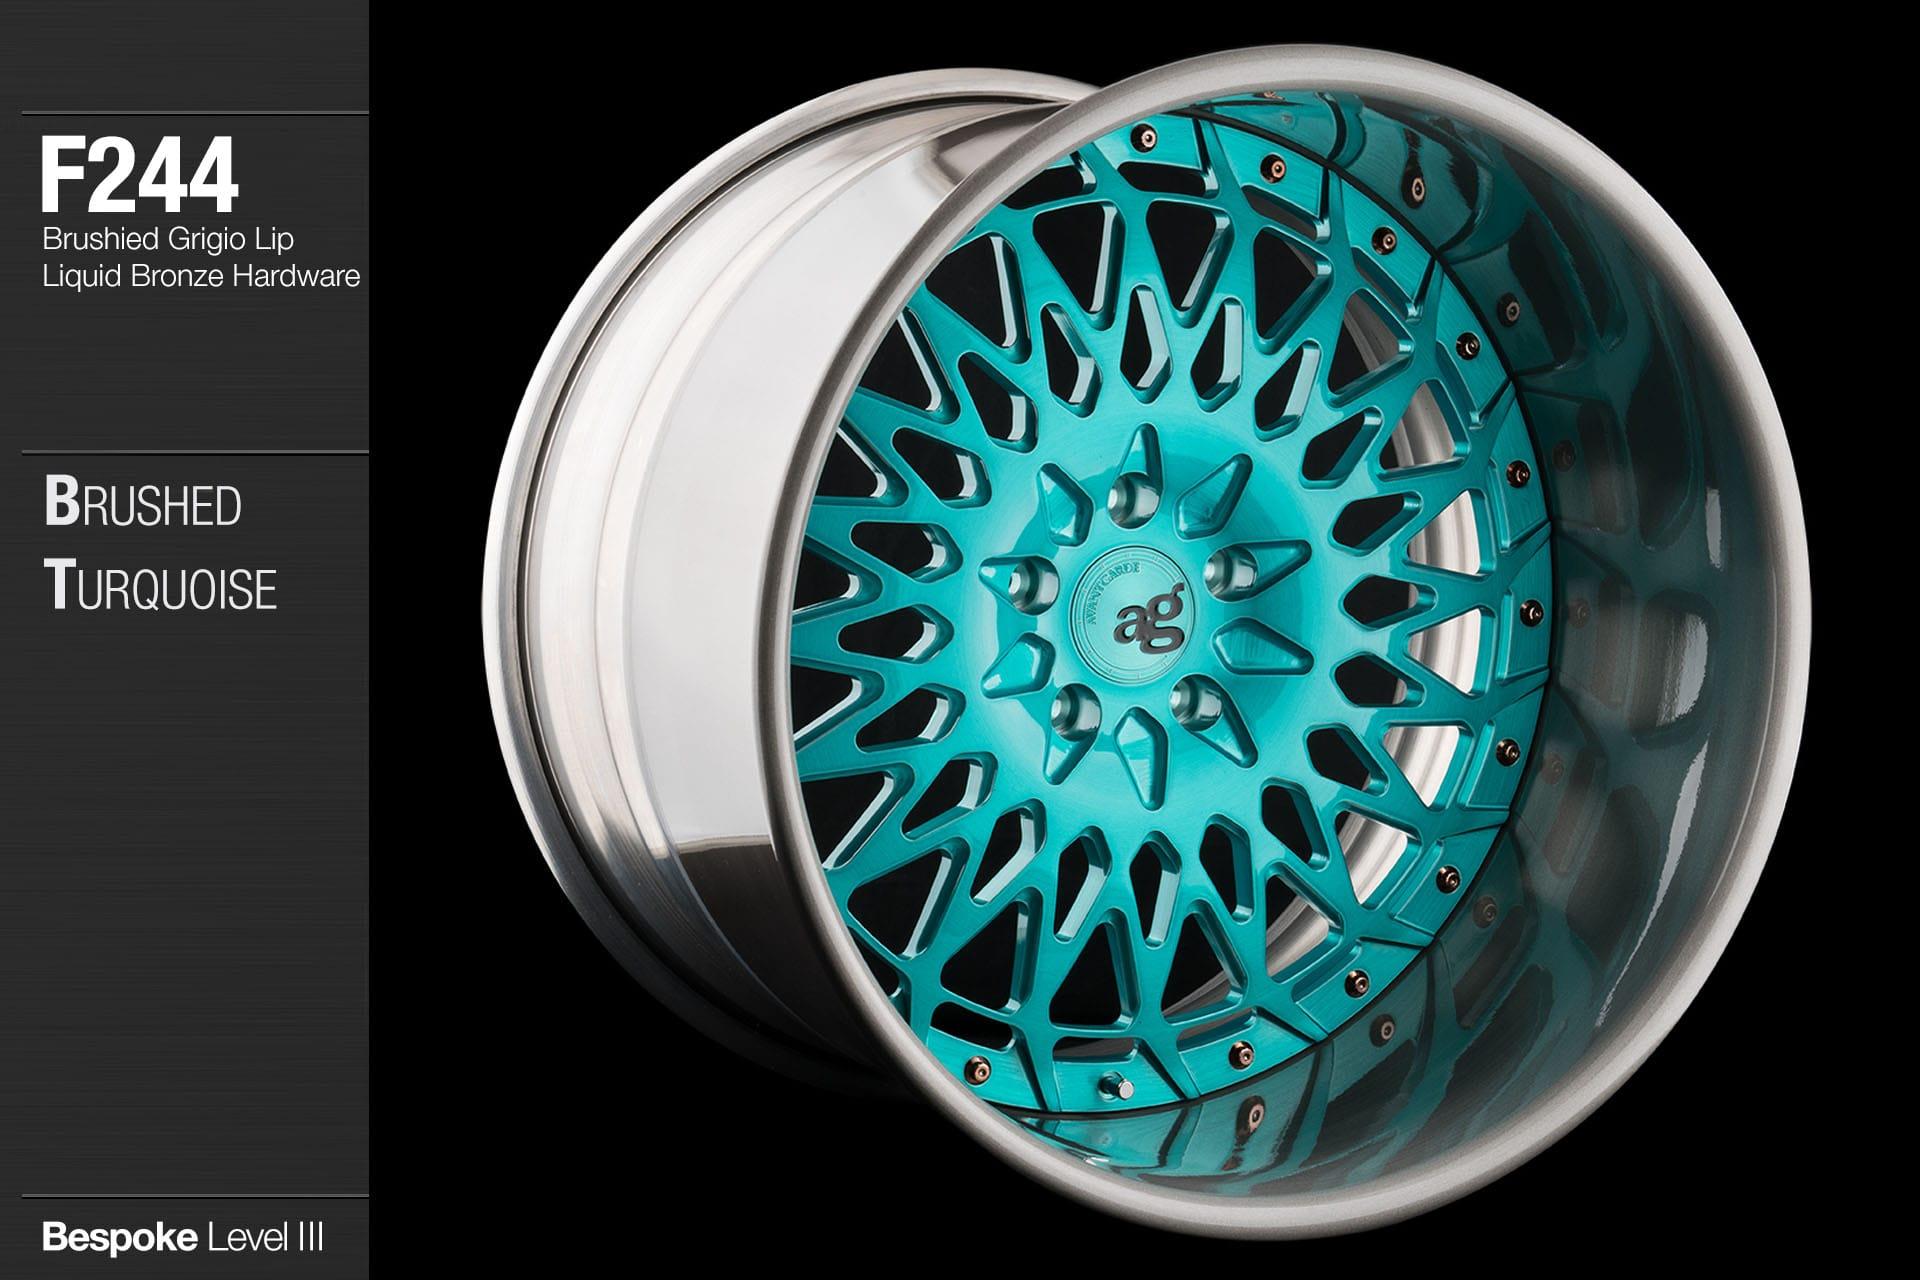 avant garde f244 brushed turquoise center brushed grigio lip liquid bronze hardware